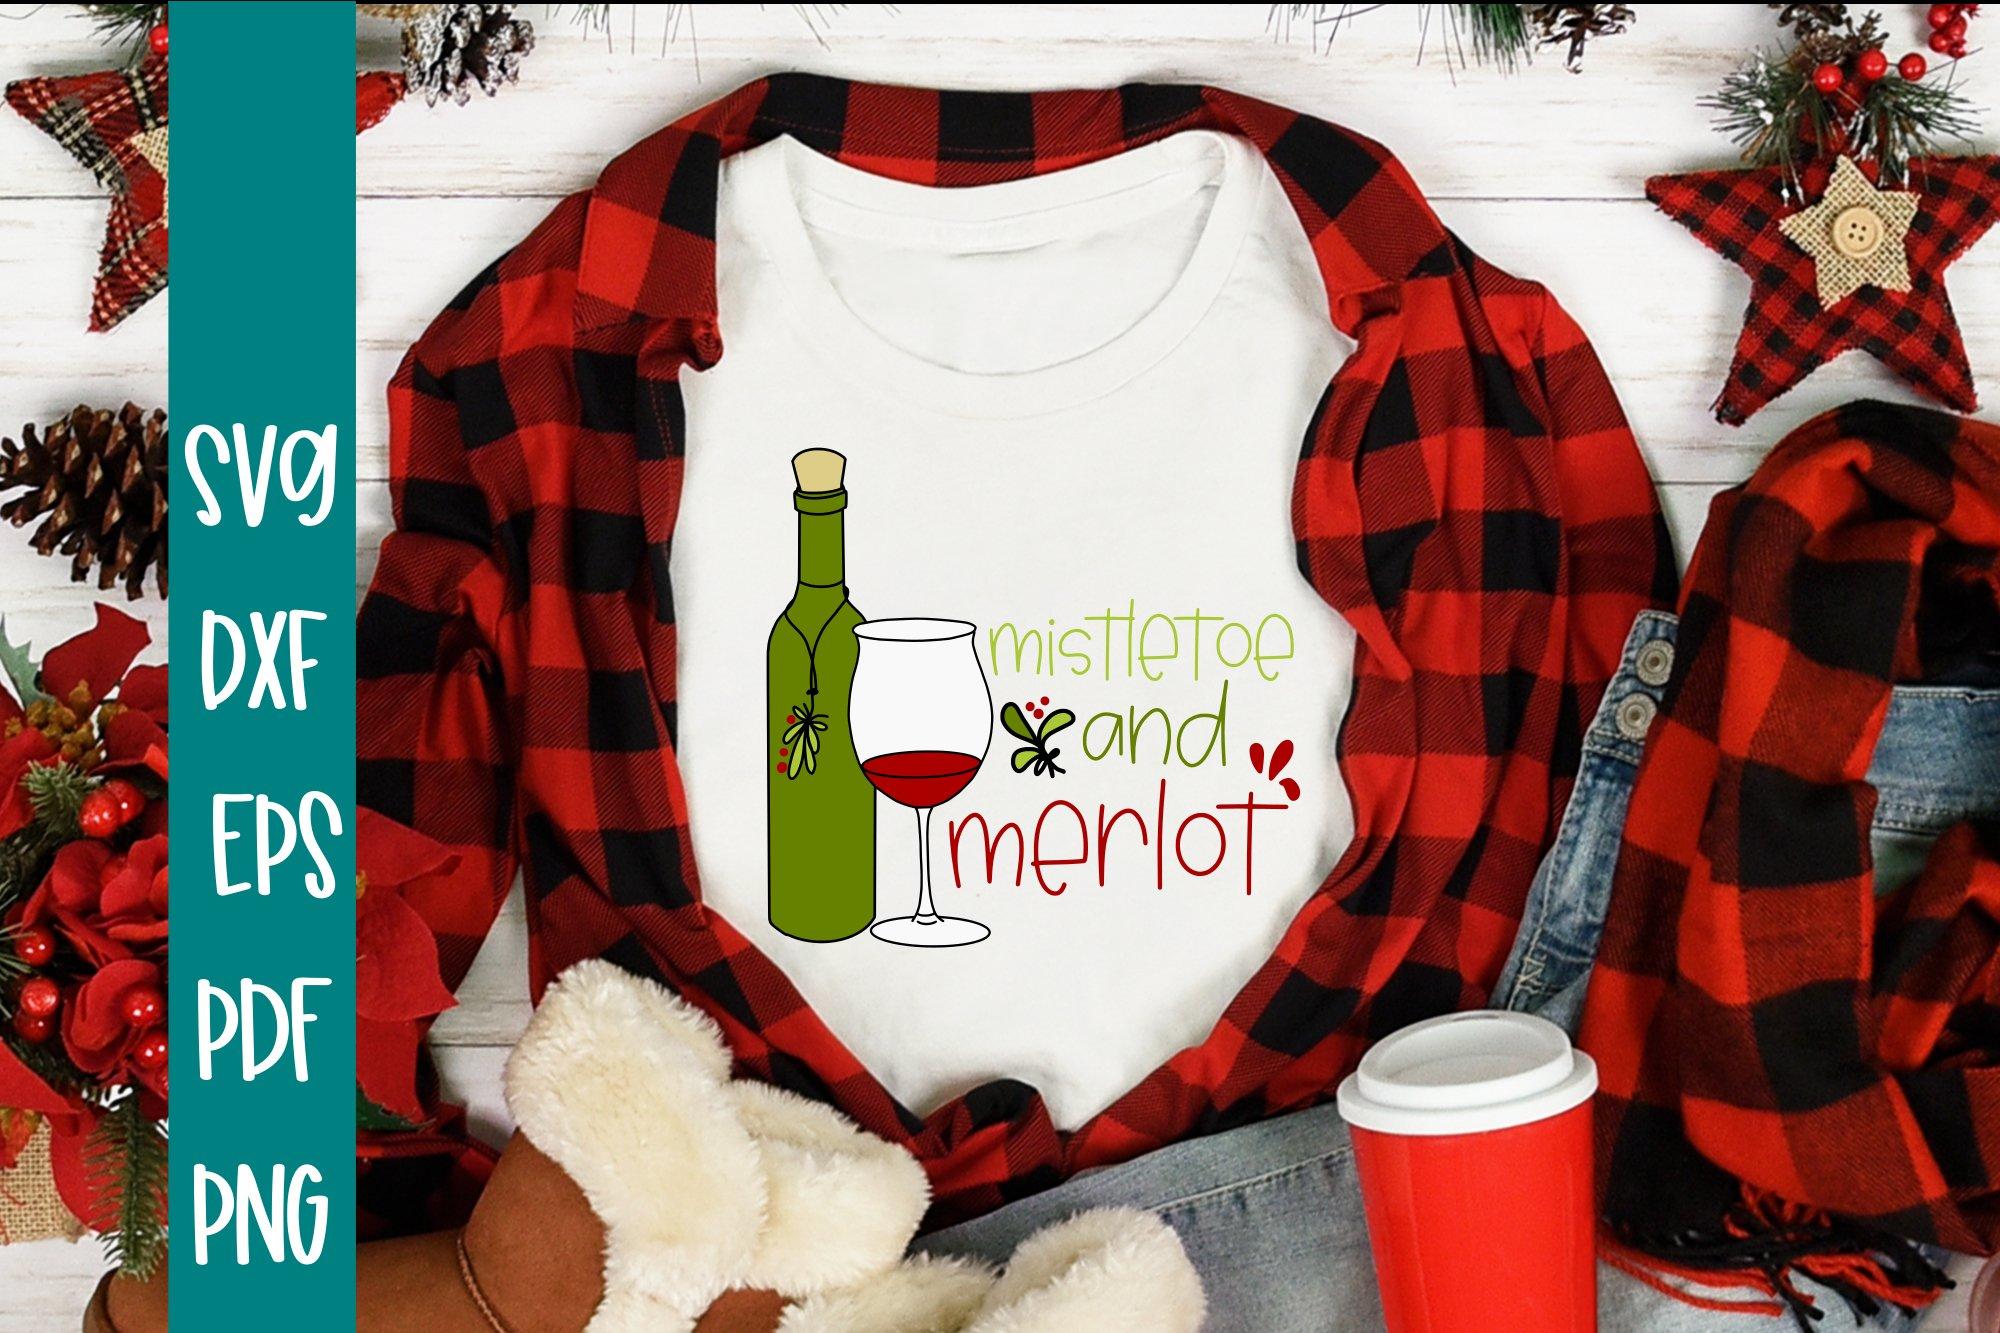 Mistletoe and Merlot Christmas SVG example image 1